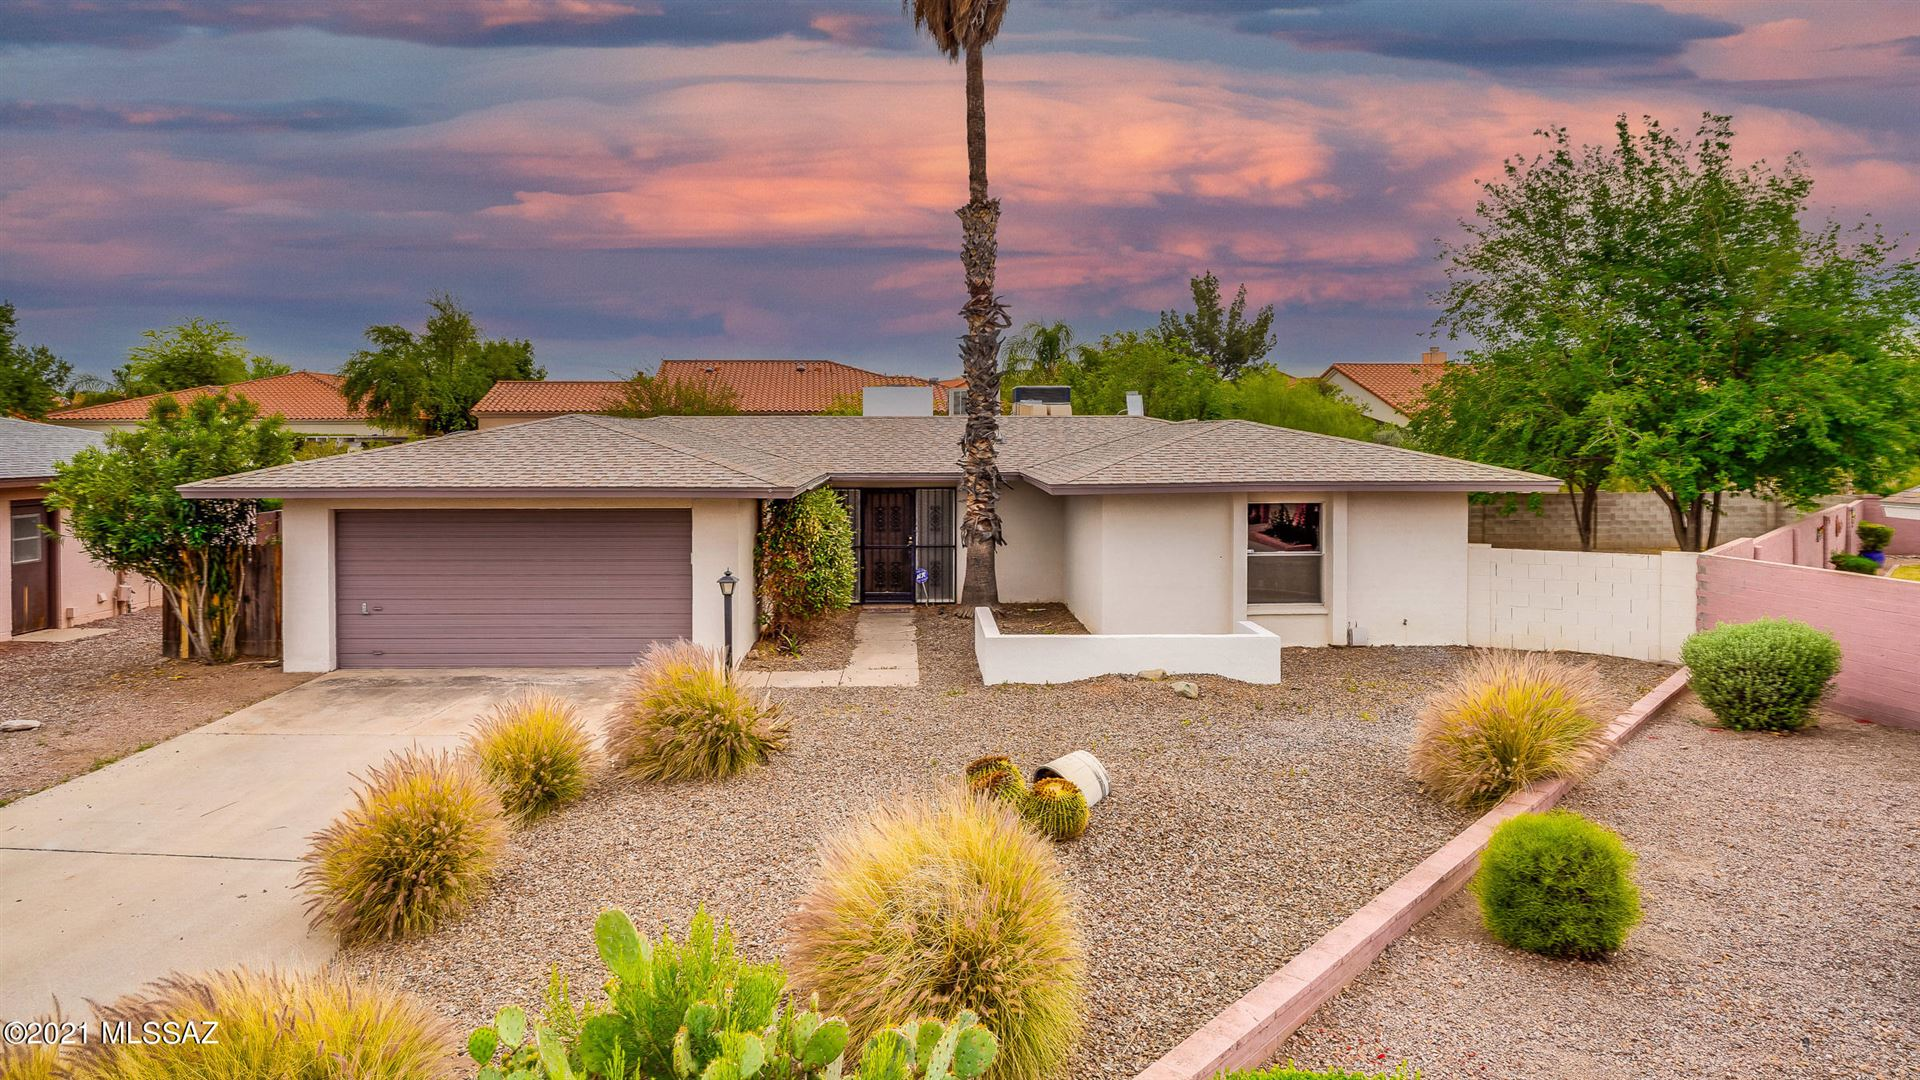 7360 E Rio Verde Drive, Tucson, AZ 85715 - MLS#: 22109936